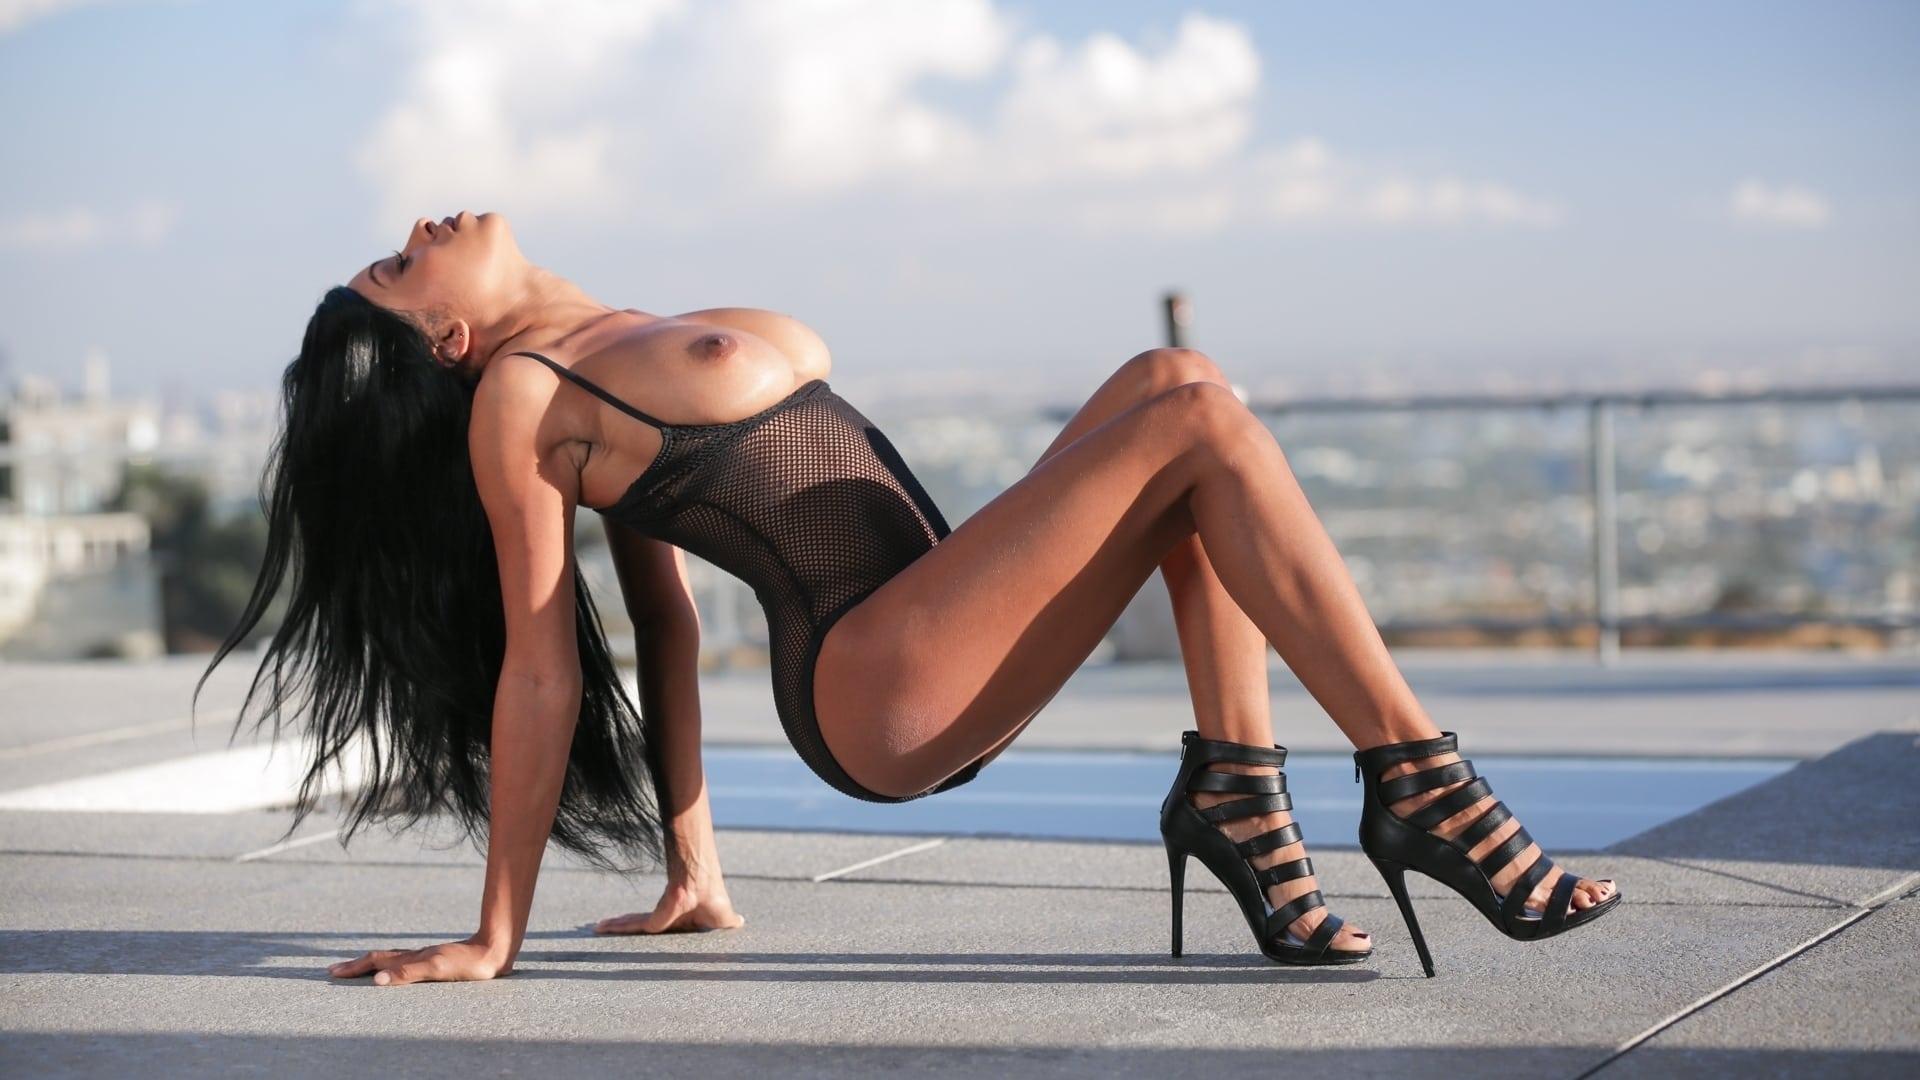 nipples-high-heels-videos-amateur-asian-post-uncensored